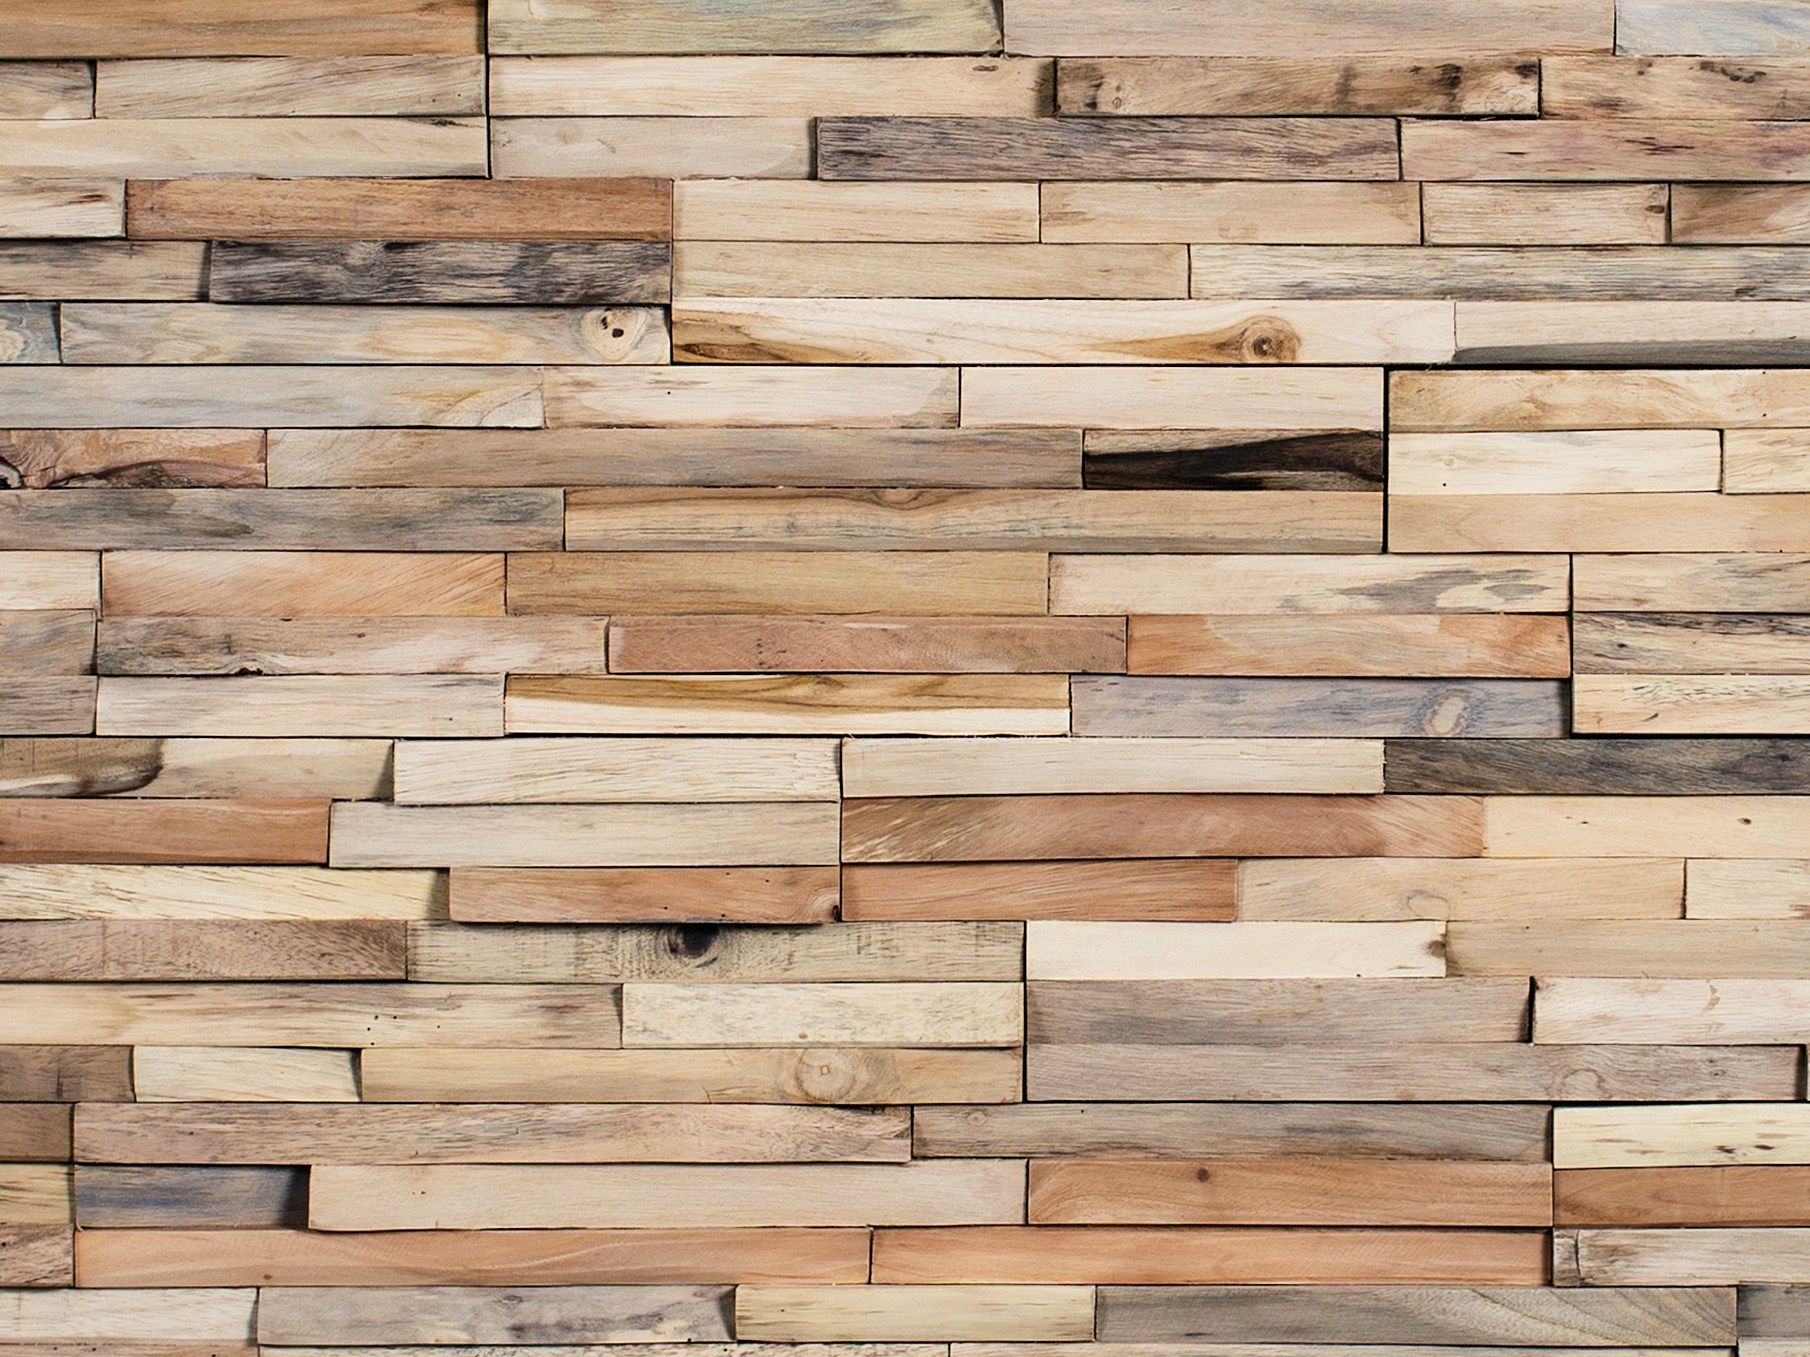 dalles adh sives murales izalco en bois. Black Bedroom Furniture Sets. Home Design Ideas